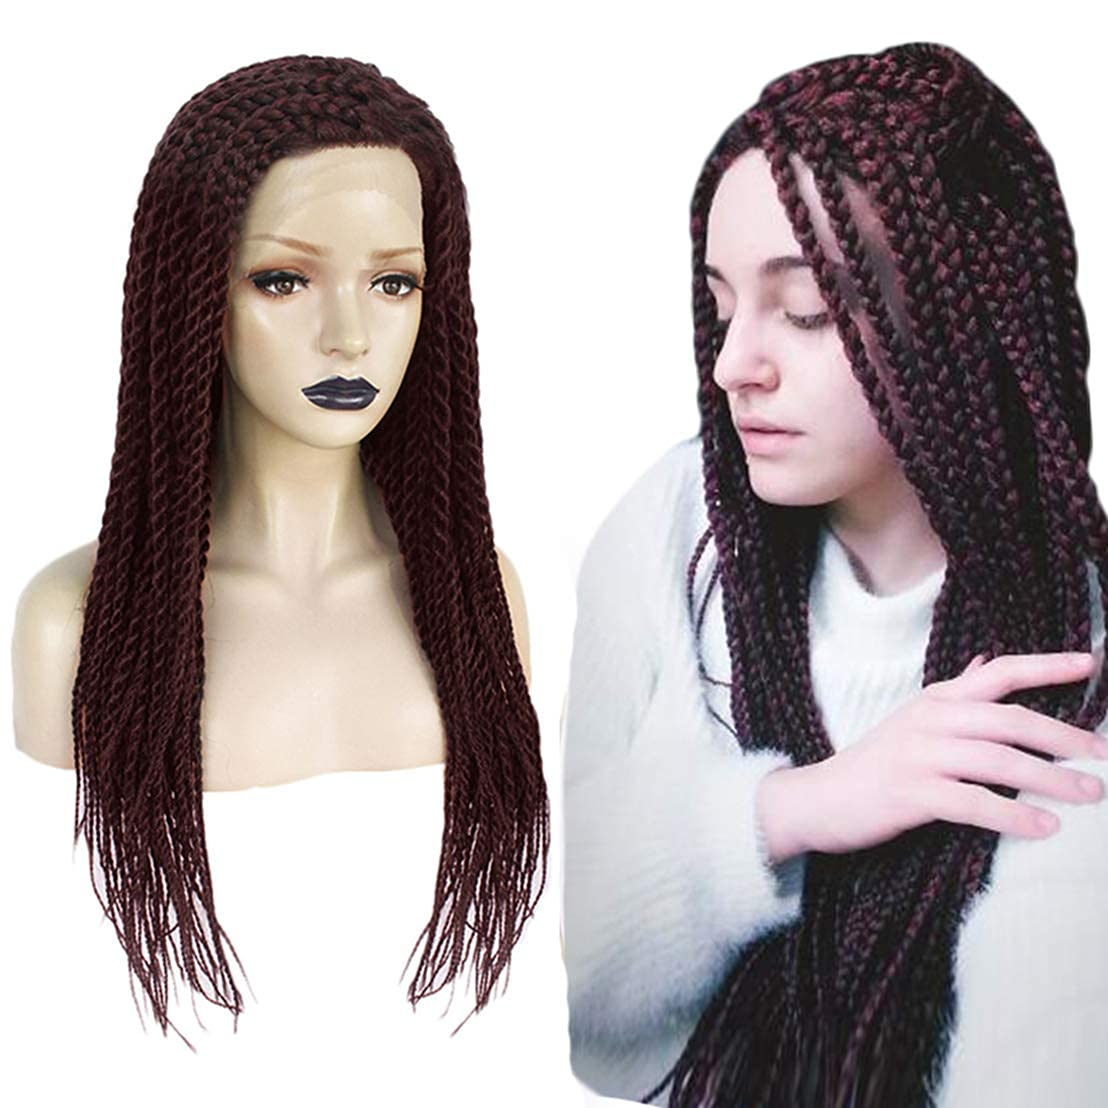 Jsmhh Braided Kansas City Max 42% OFF Mall Wigs Box Braid for Women Wig Black